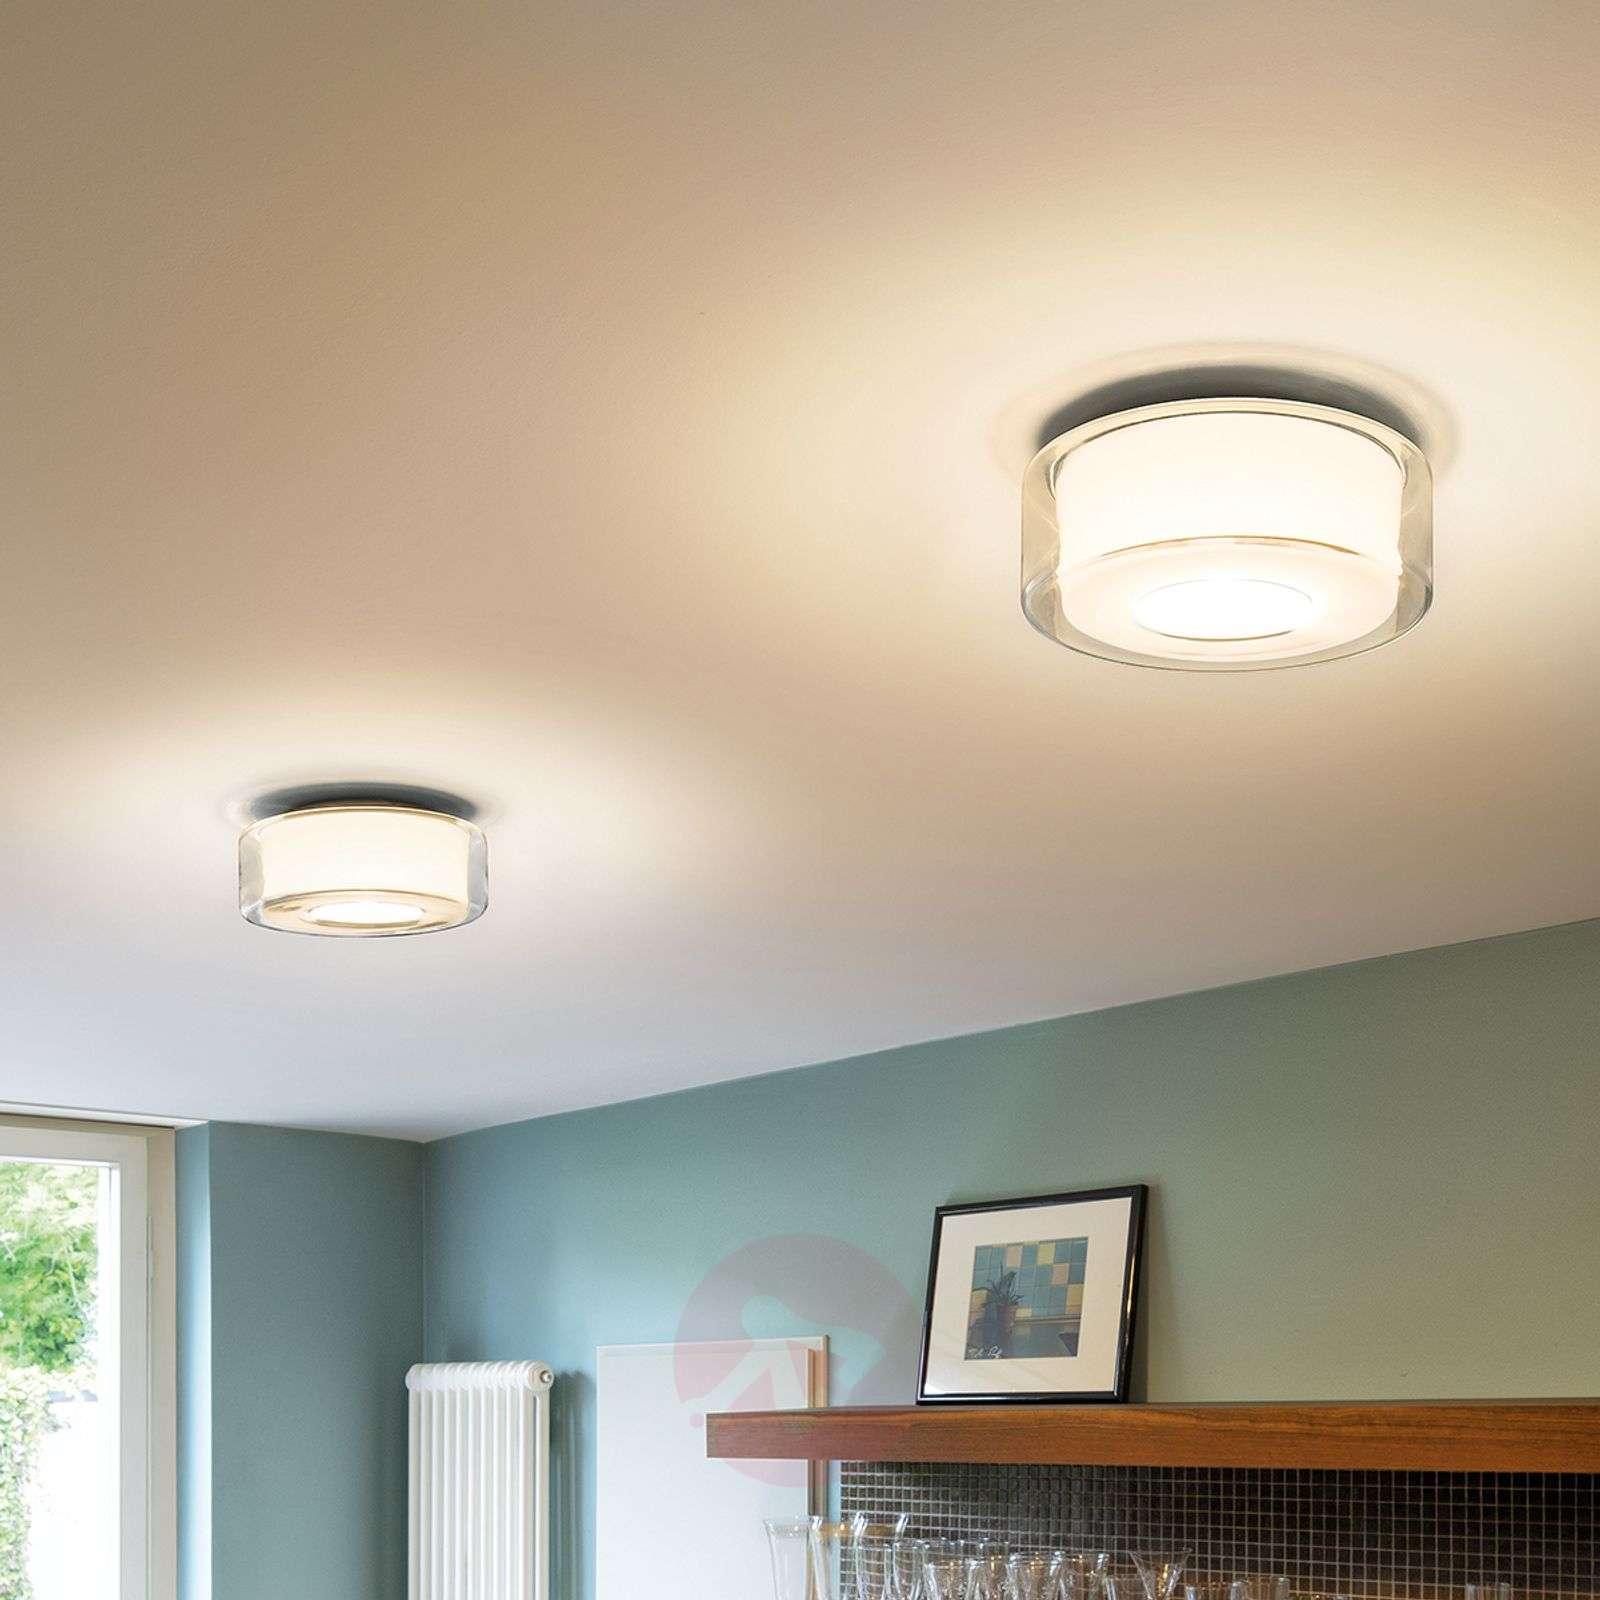 Lasinen LED-design-kattovalaisin Curling-8550016-01